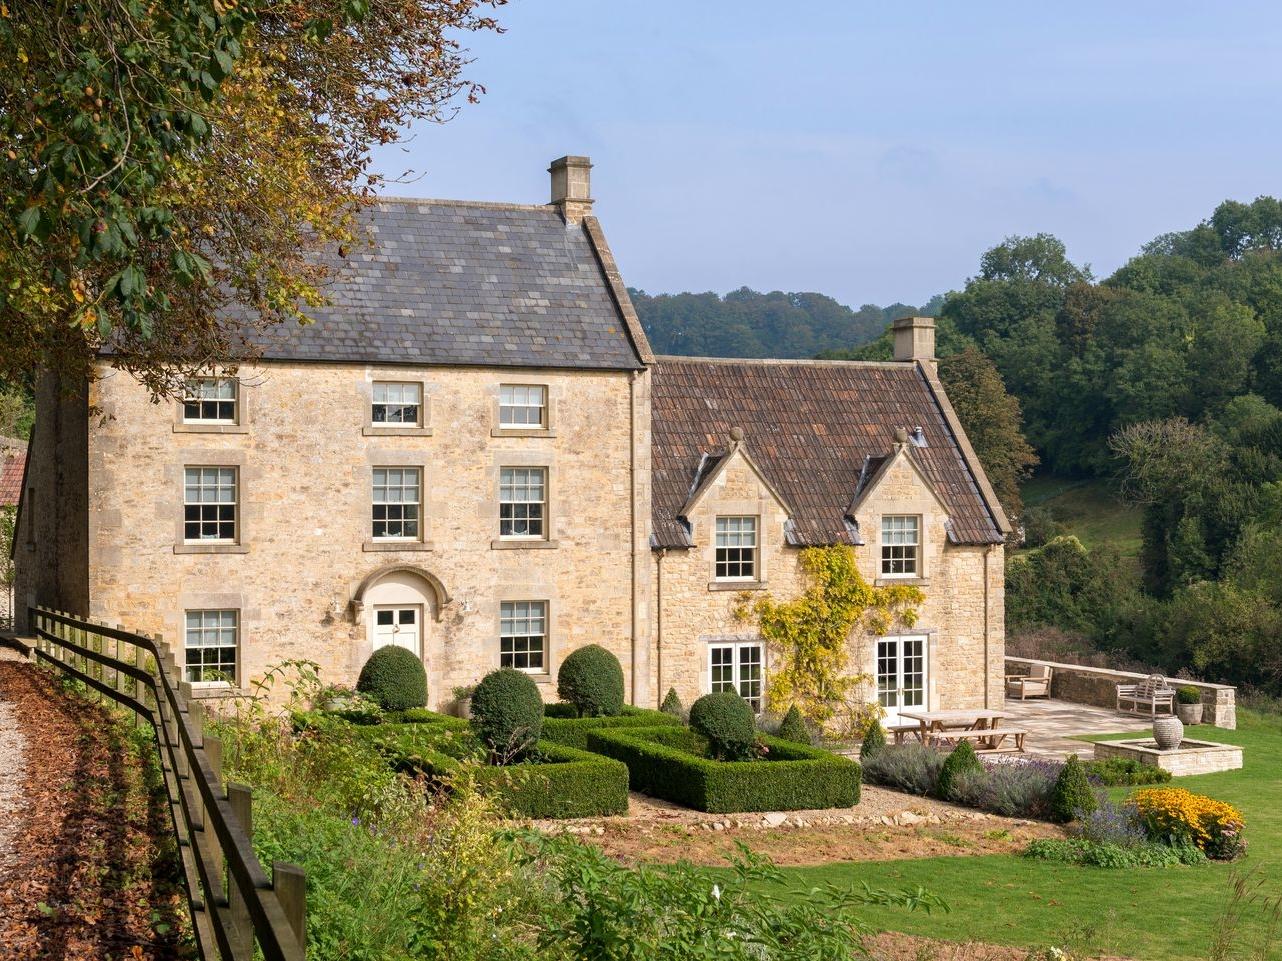 8 bedroom Cottage for rent in Bath